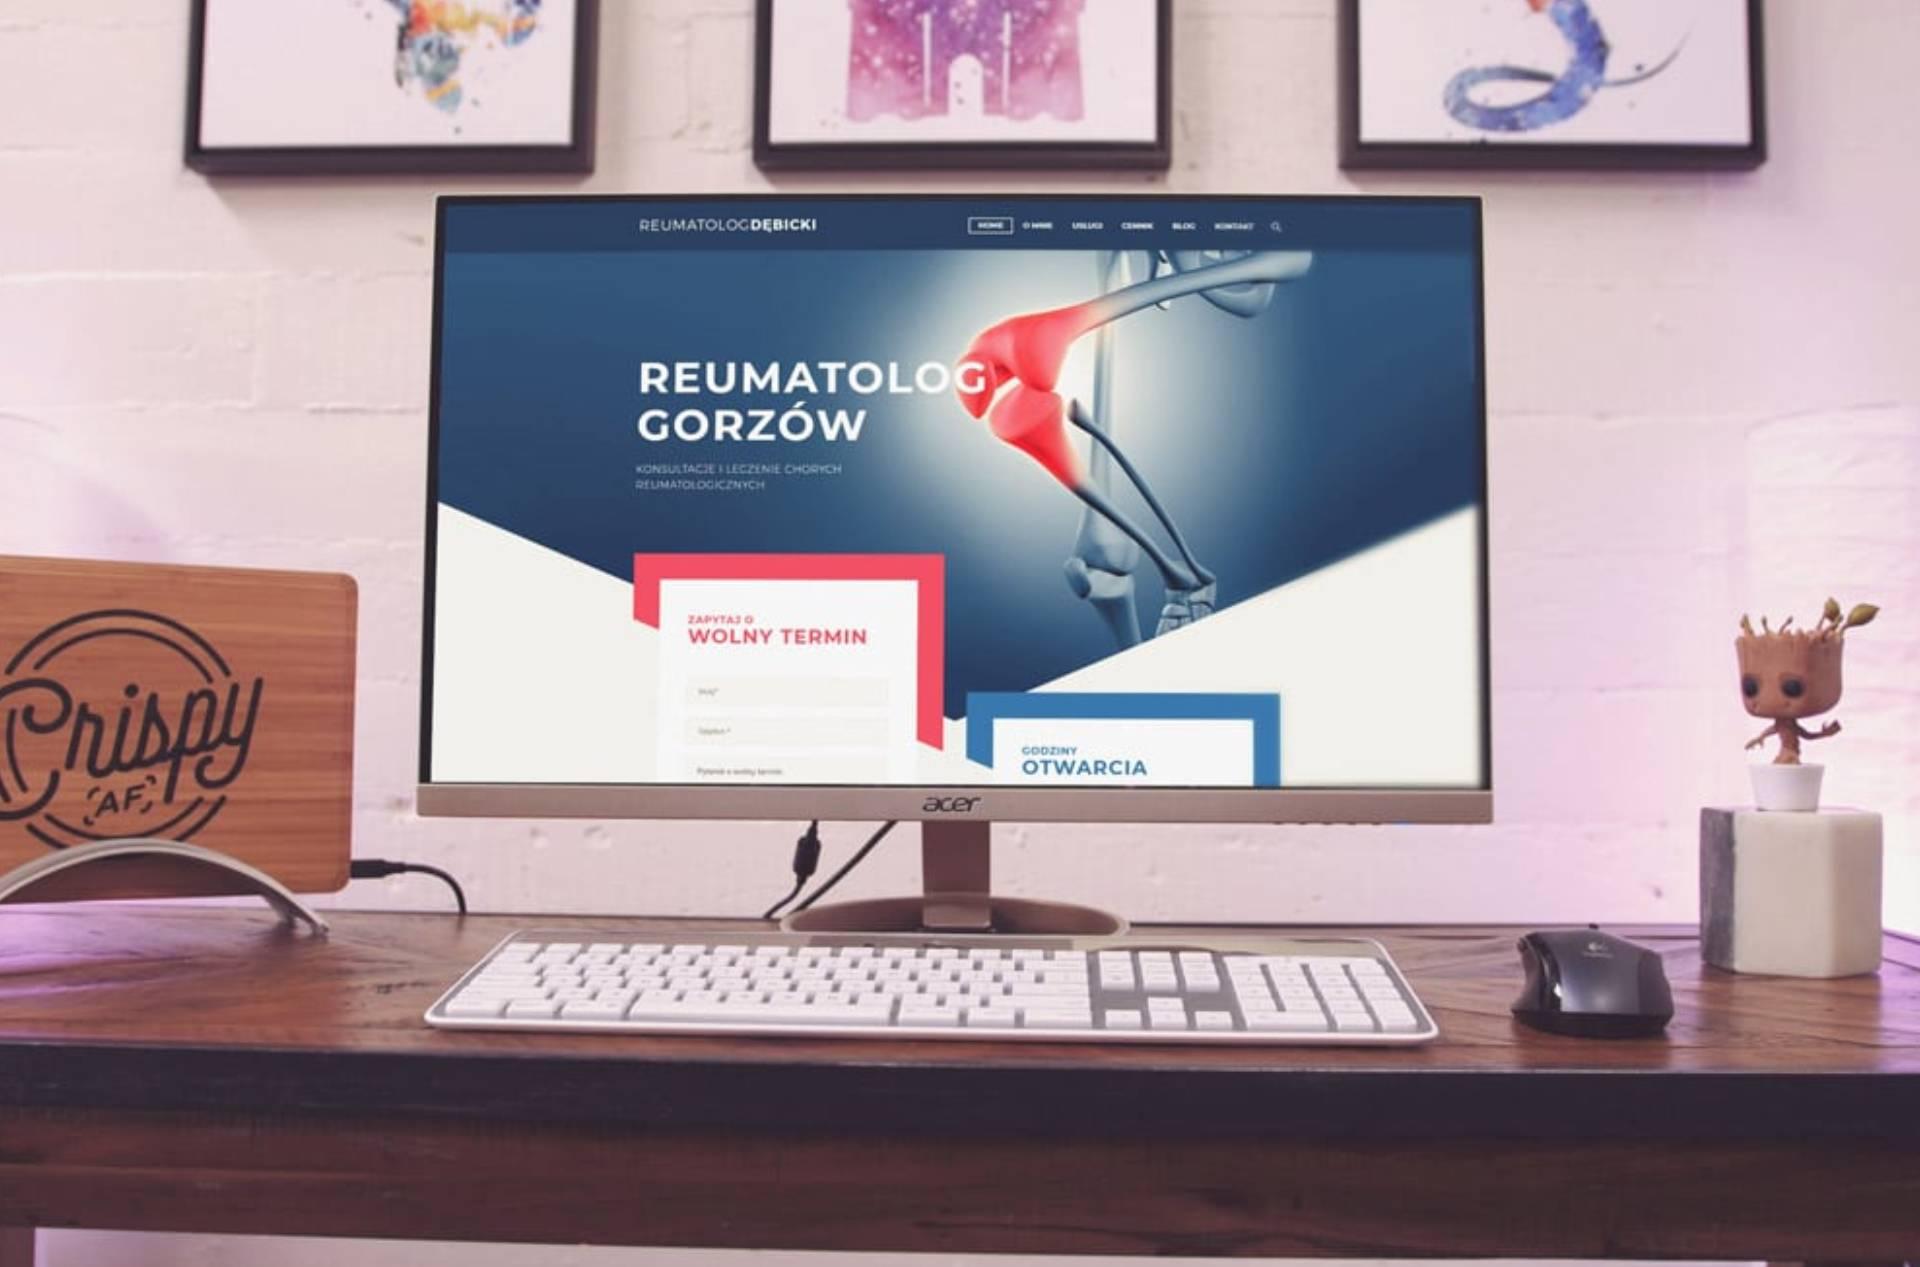 Roan24 Reumatolog Debicki.pl Strona Internetowa